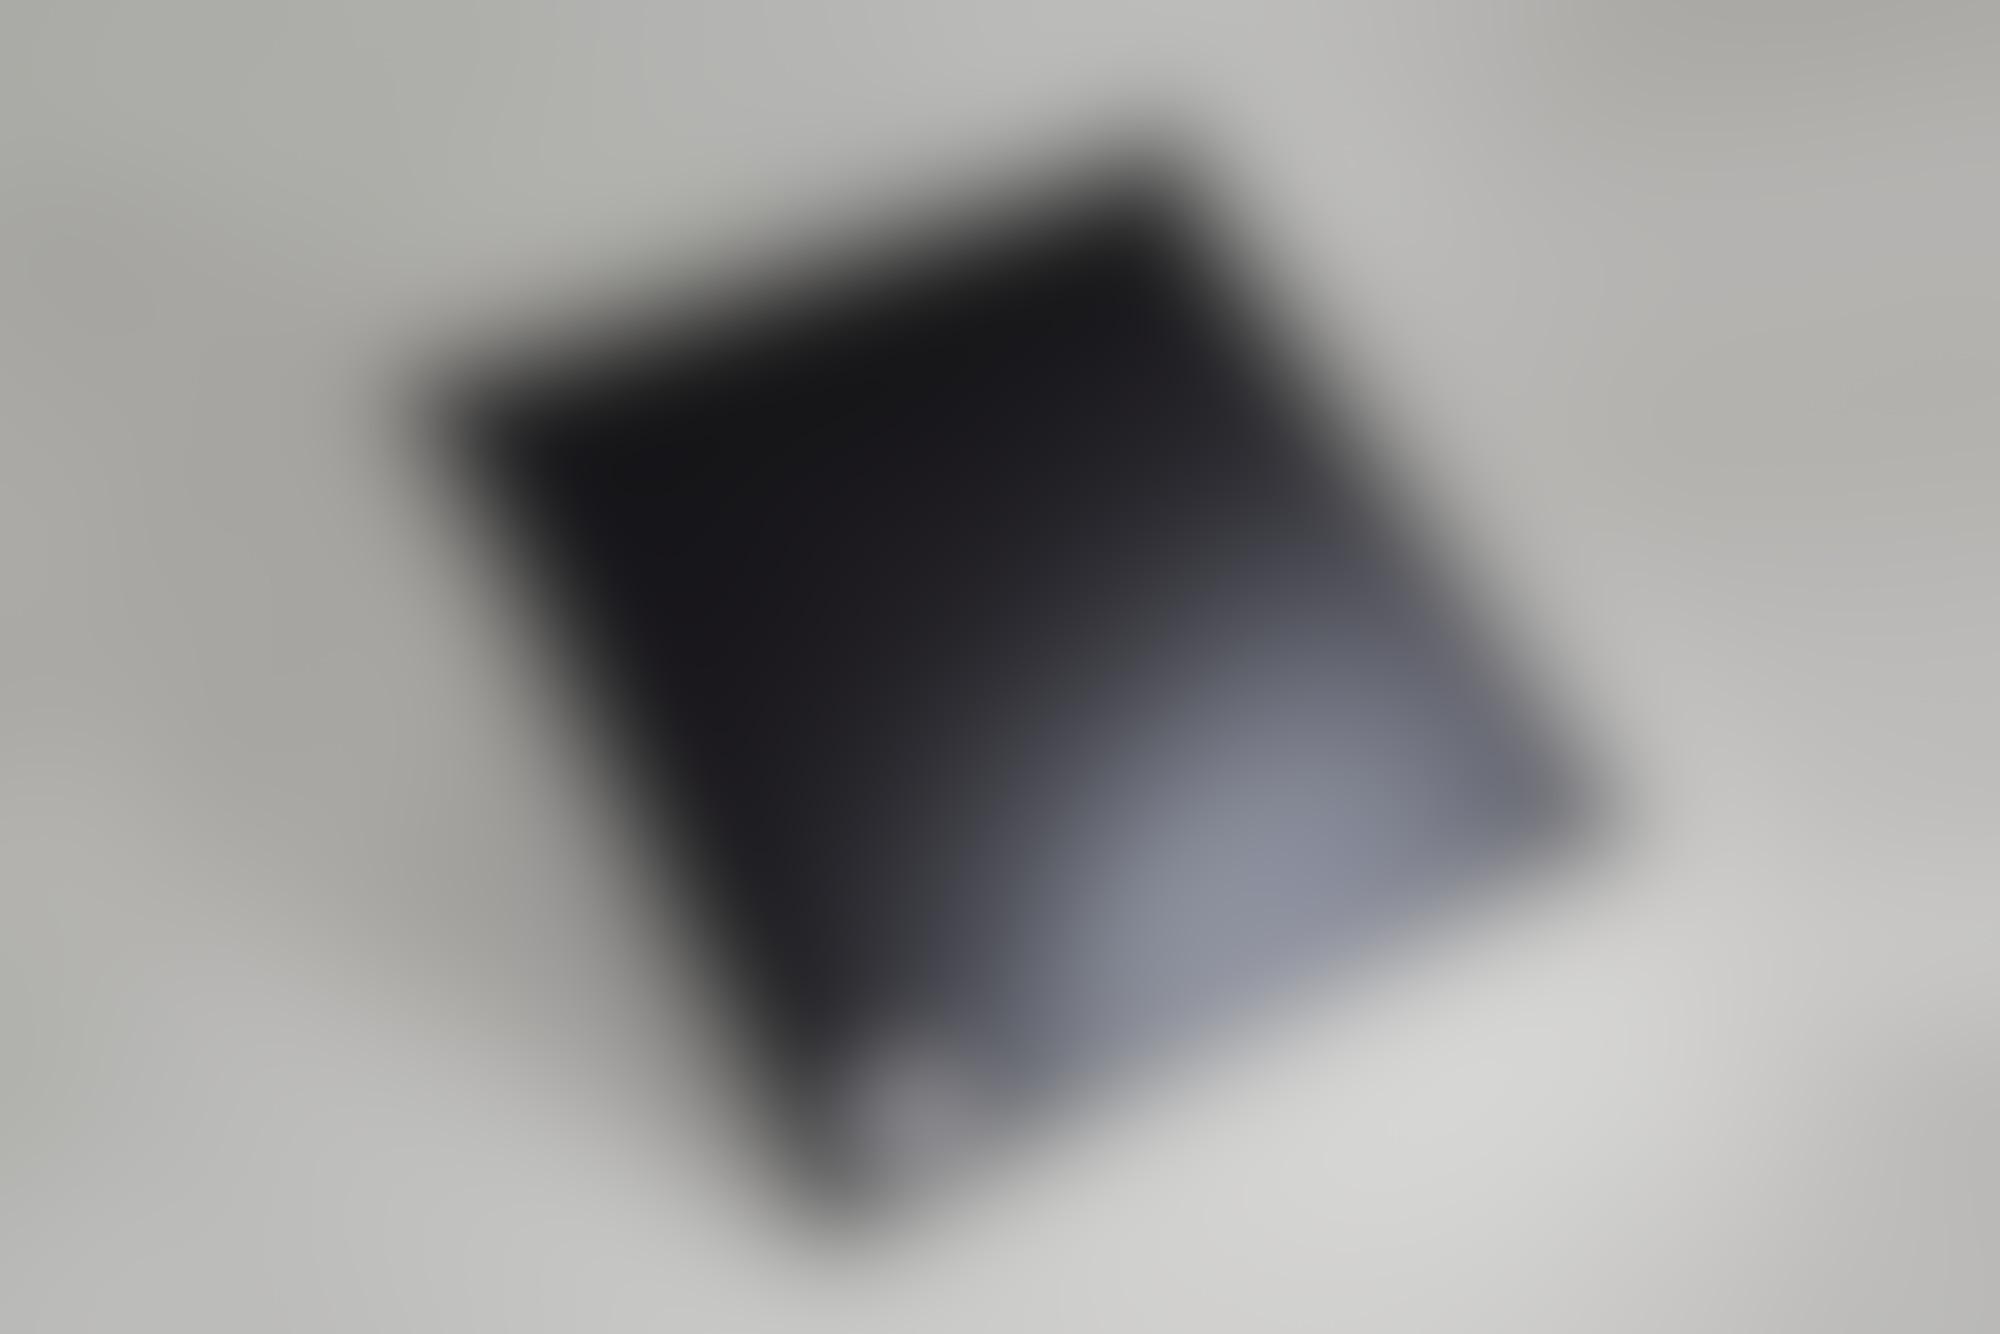 DB Blackstar 02 1000x667 autocompressfitresizeixlibphp 1 1 0max h2000max w3 D2000q80s765f844decede53896f930eb30c3d50d